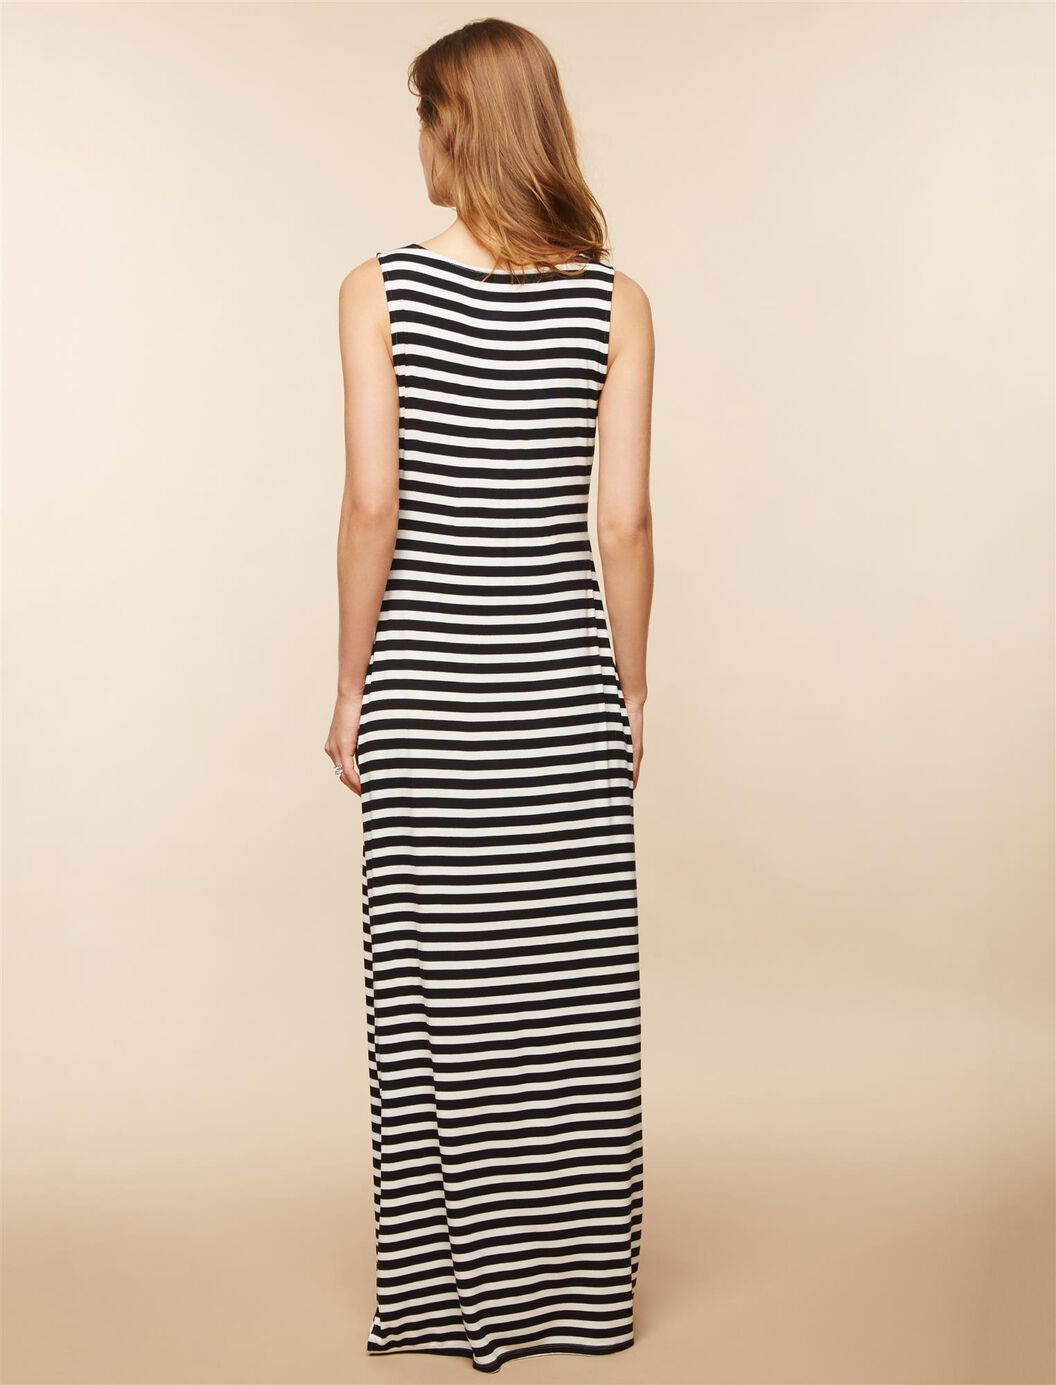 The dress access -  Side Access Knot Front Nursing Dress Black White Print